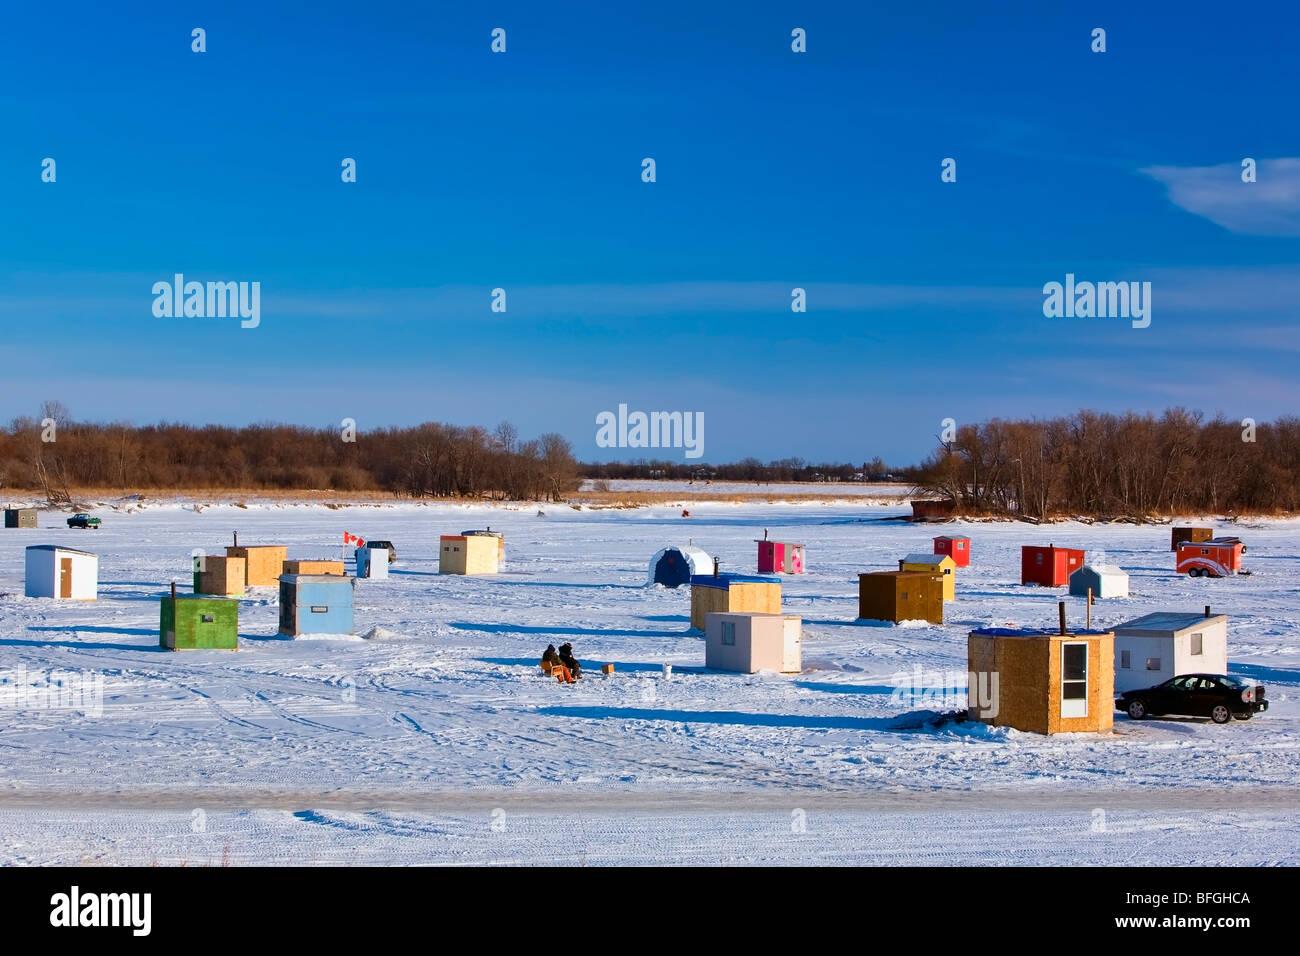 lake winnipeg ice fishing conditions